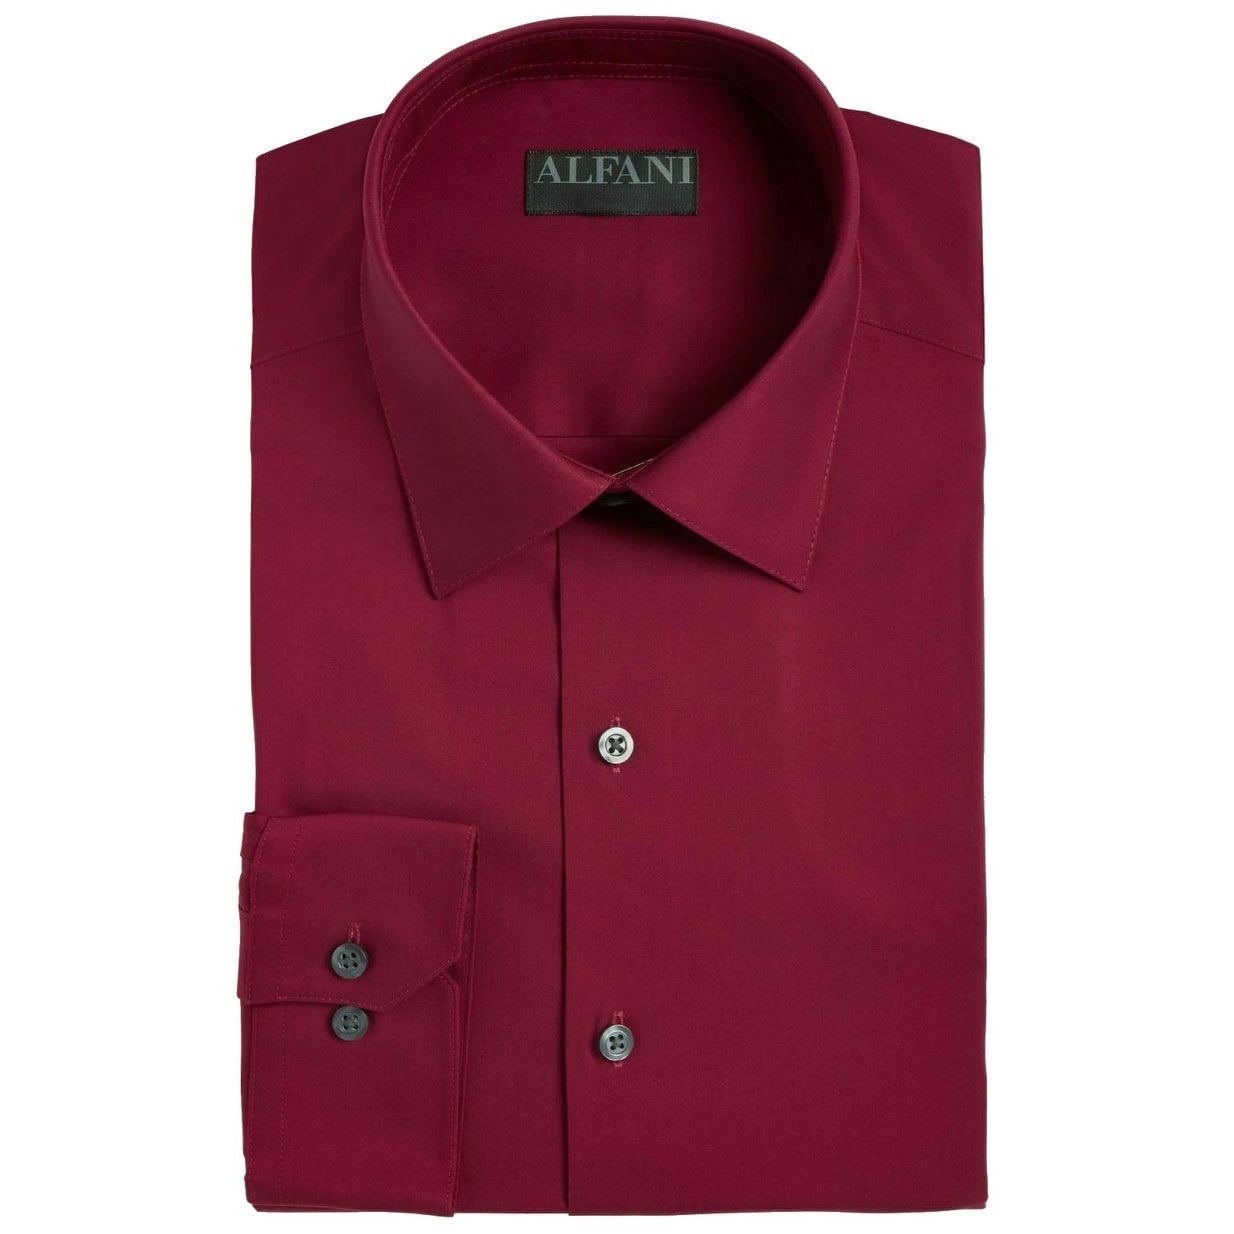 Alfani Mens Classic Fit Performance Stretch Solid Dress Shirt 16-16 1//2 32//33